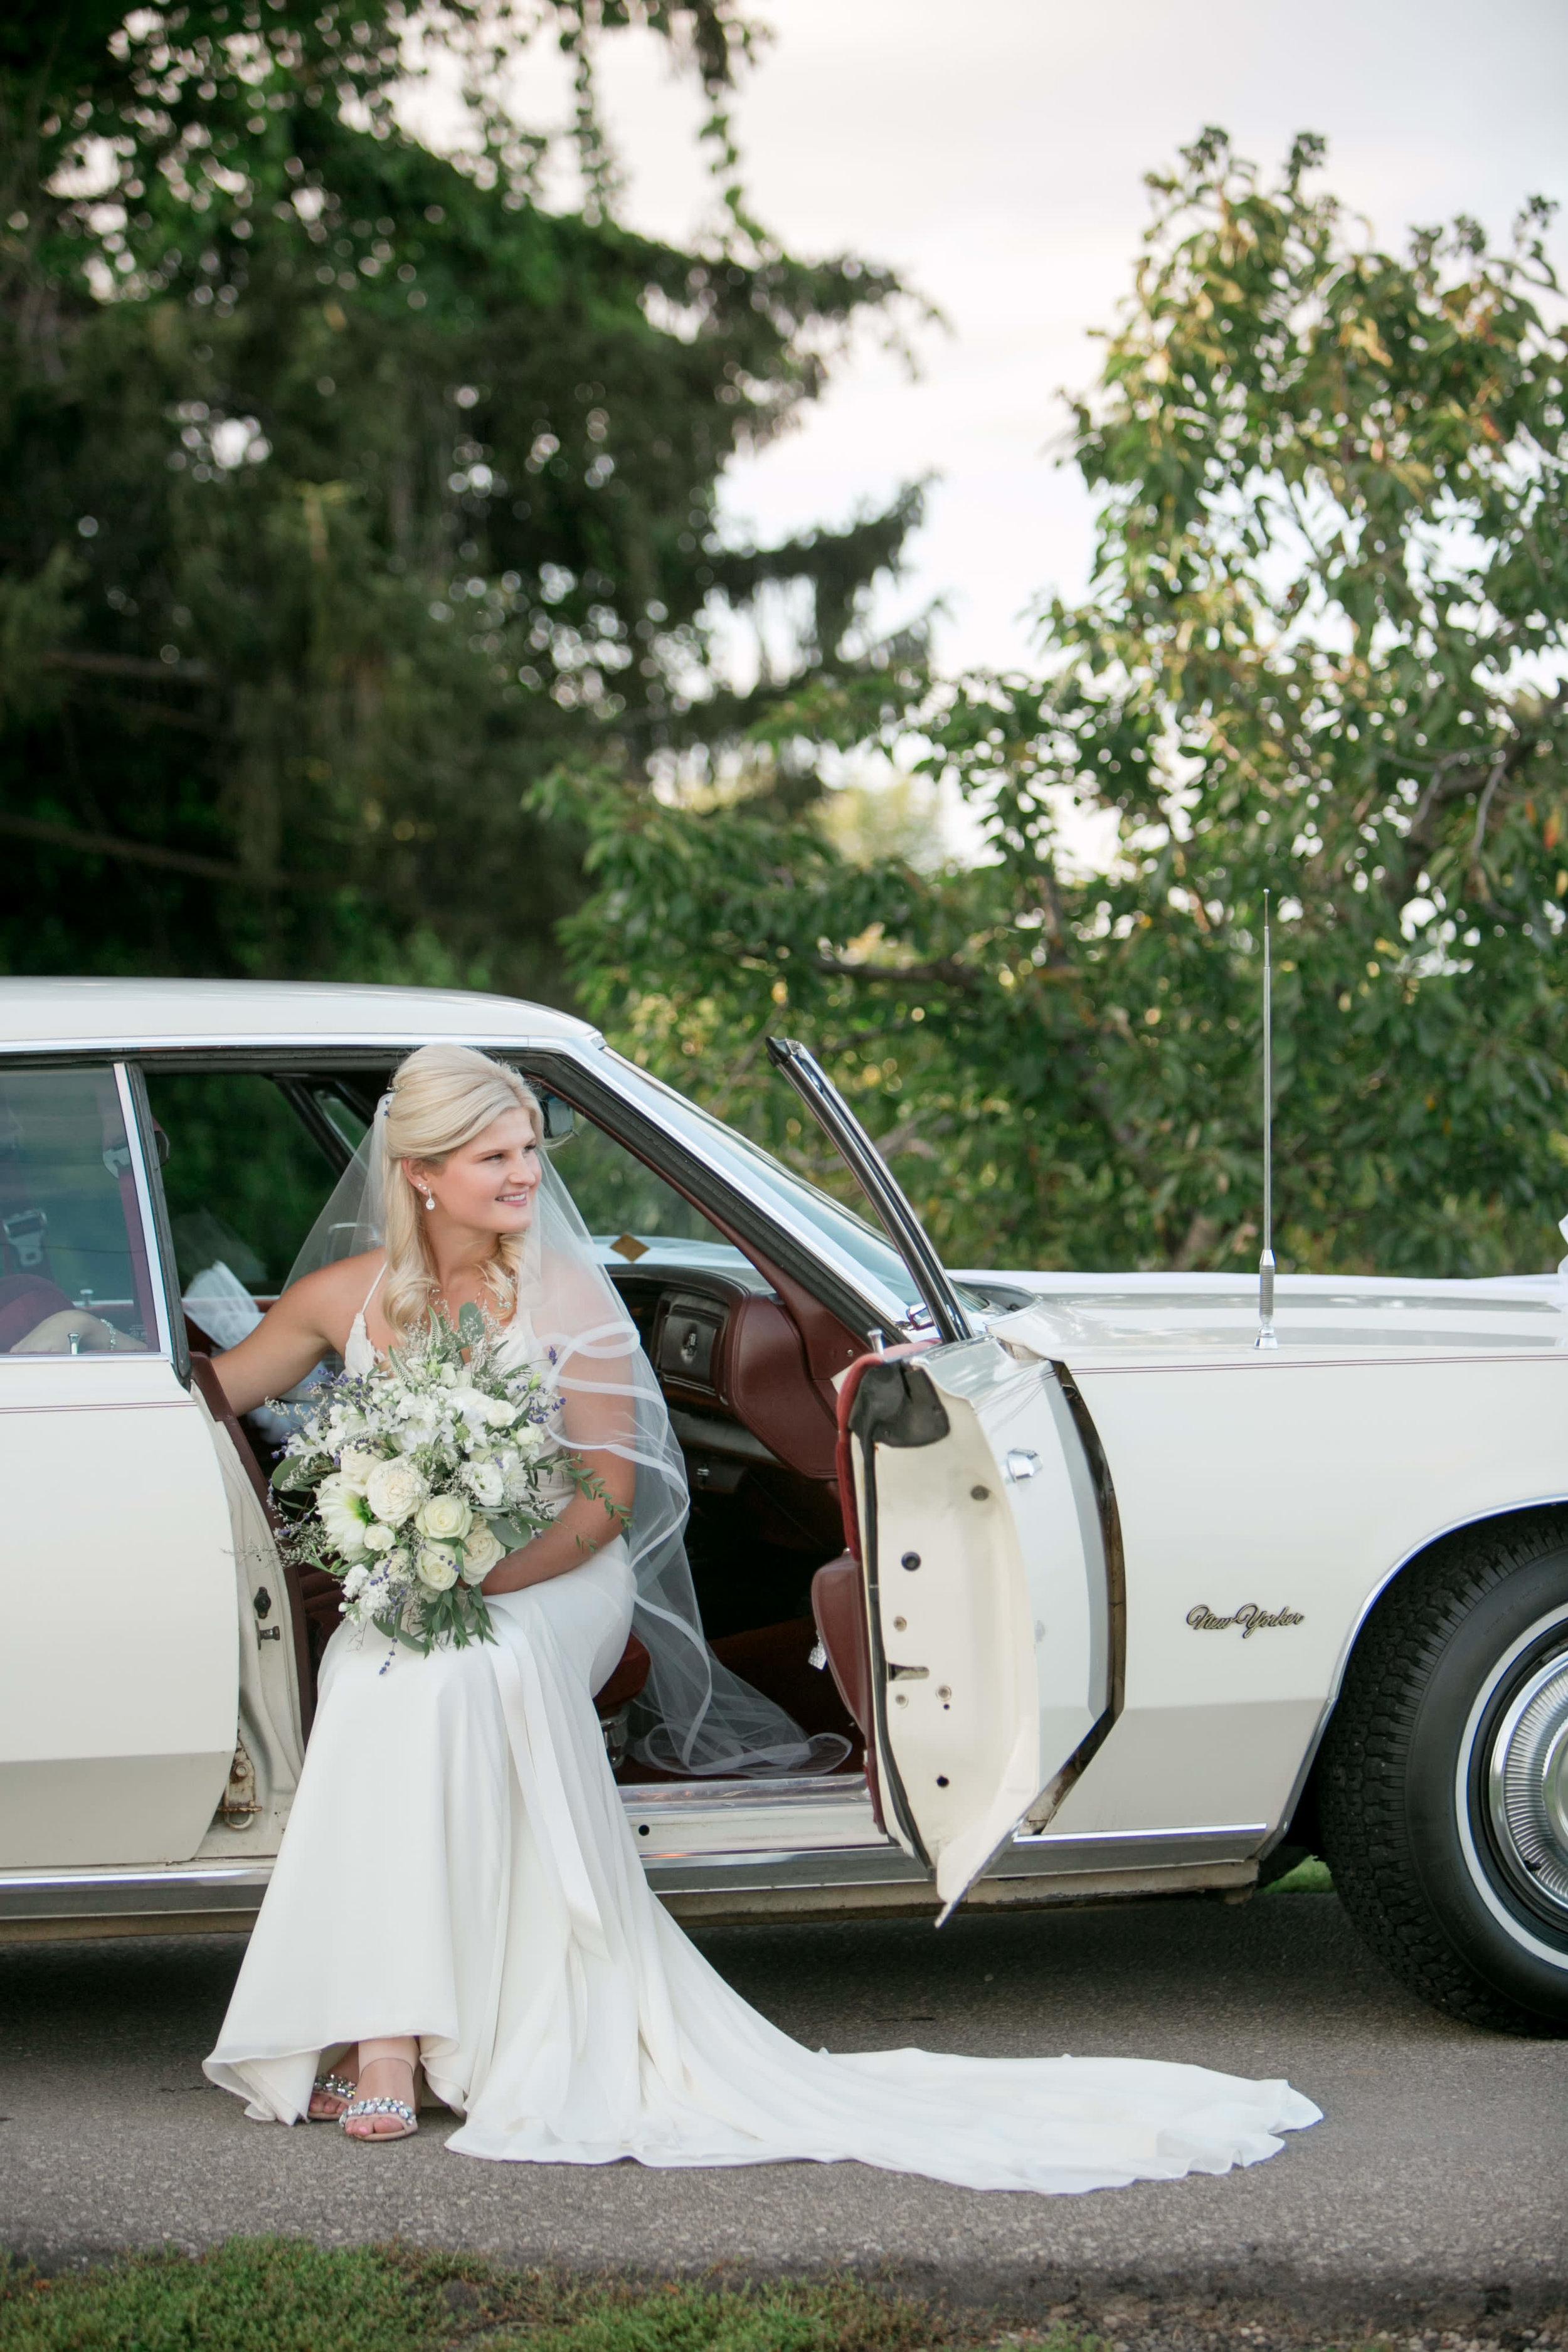 Maddy___Brandon___Daniel_Ricci_Weddings_High_Res._Finals_419.jpg